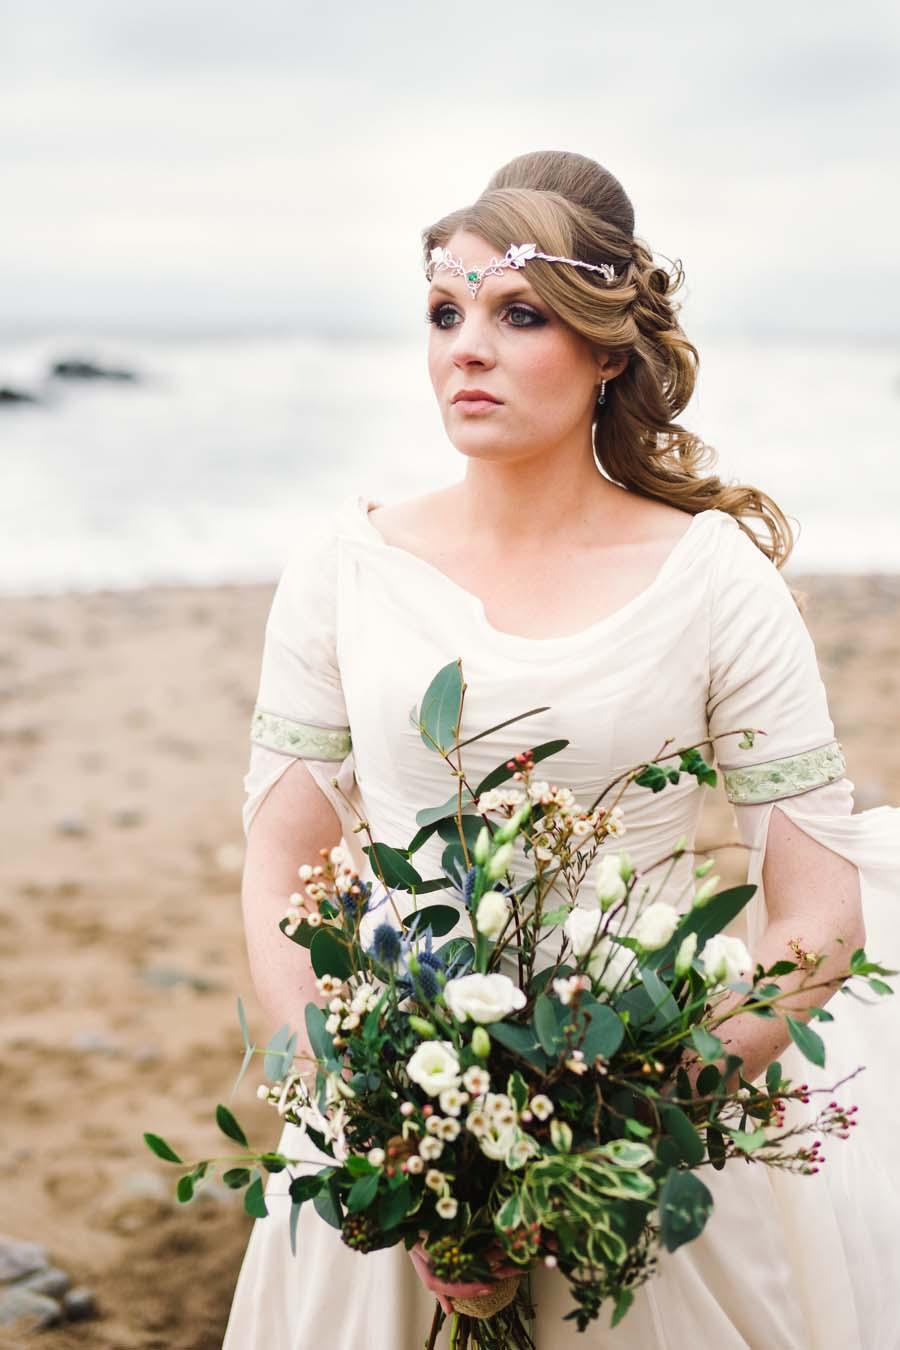 Irish wedding dress styles traditional irish wedding for Celtic wedding dresses for sale